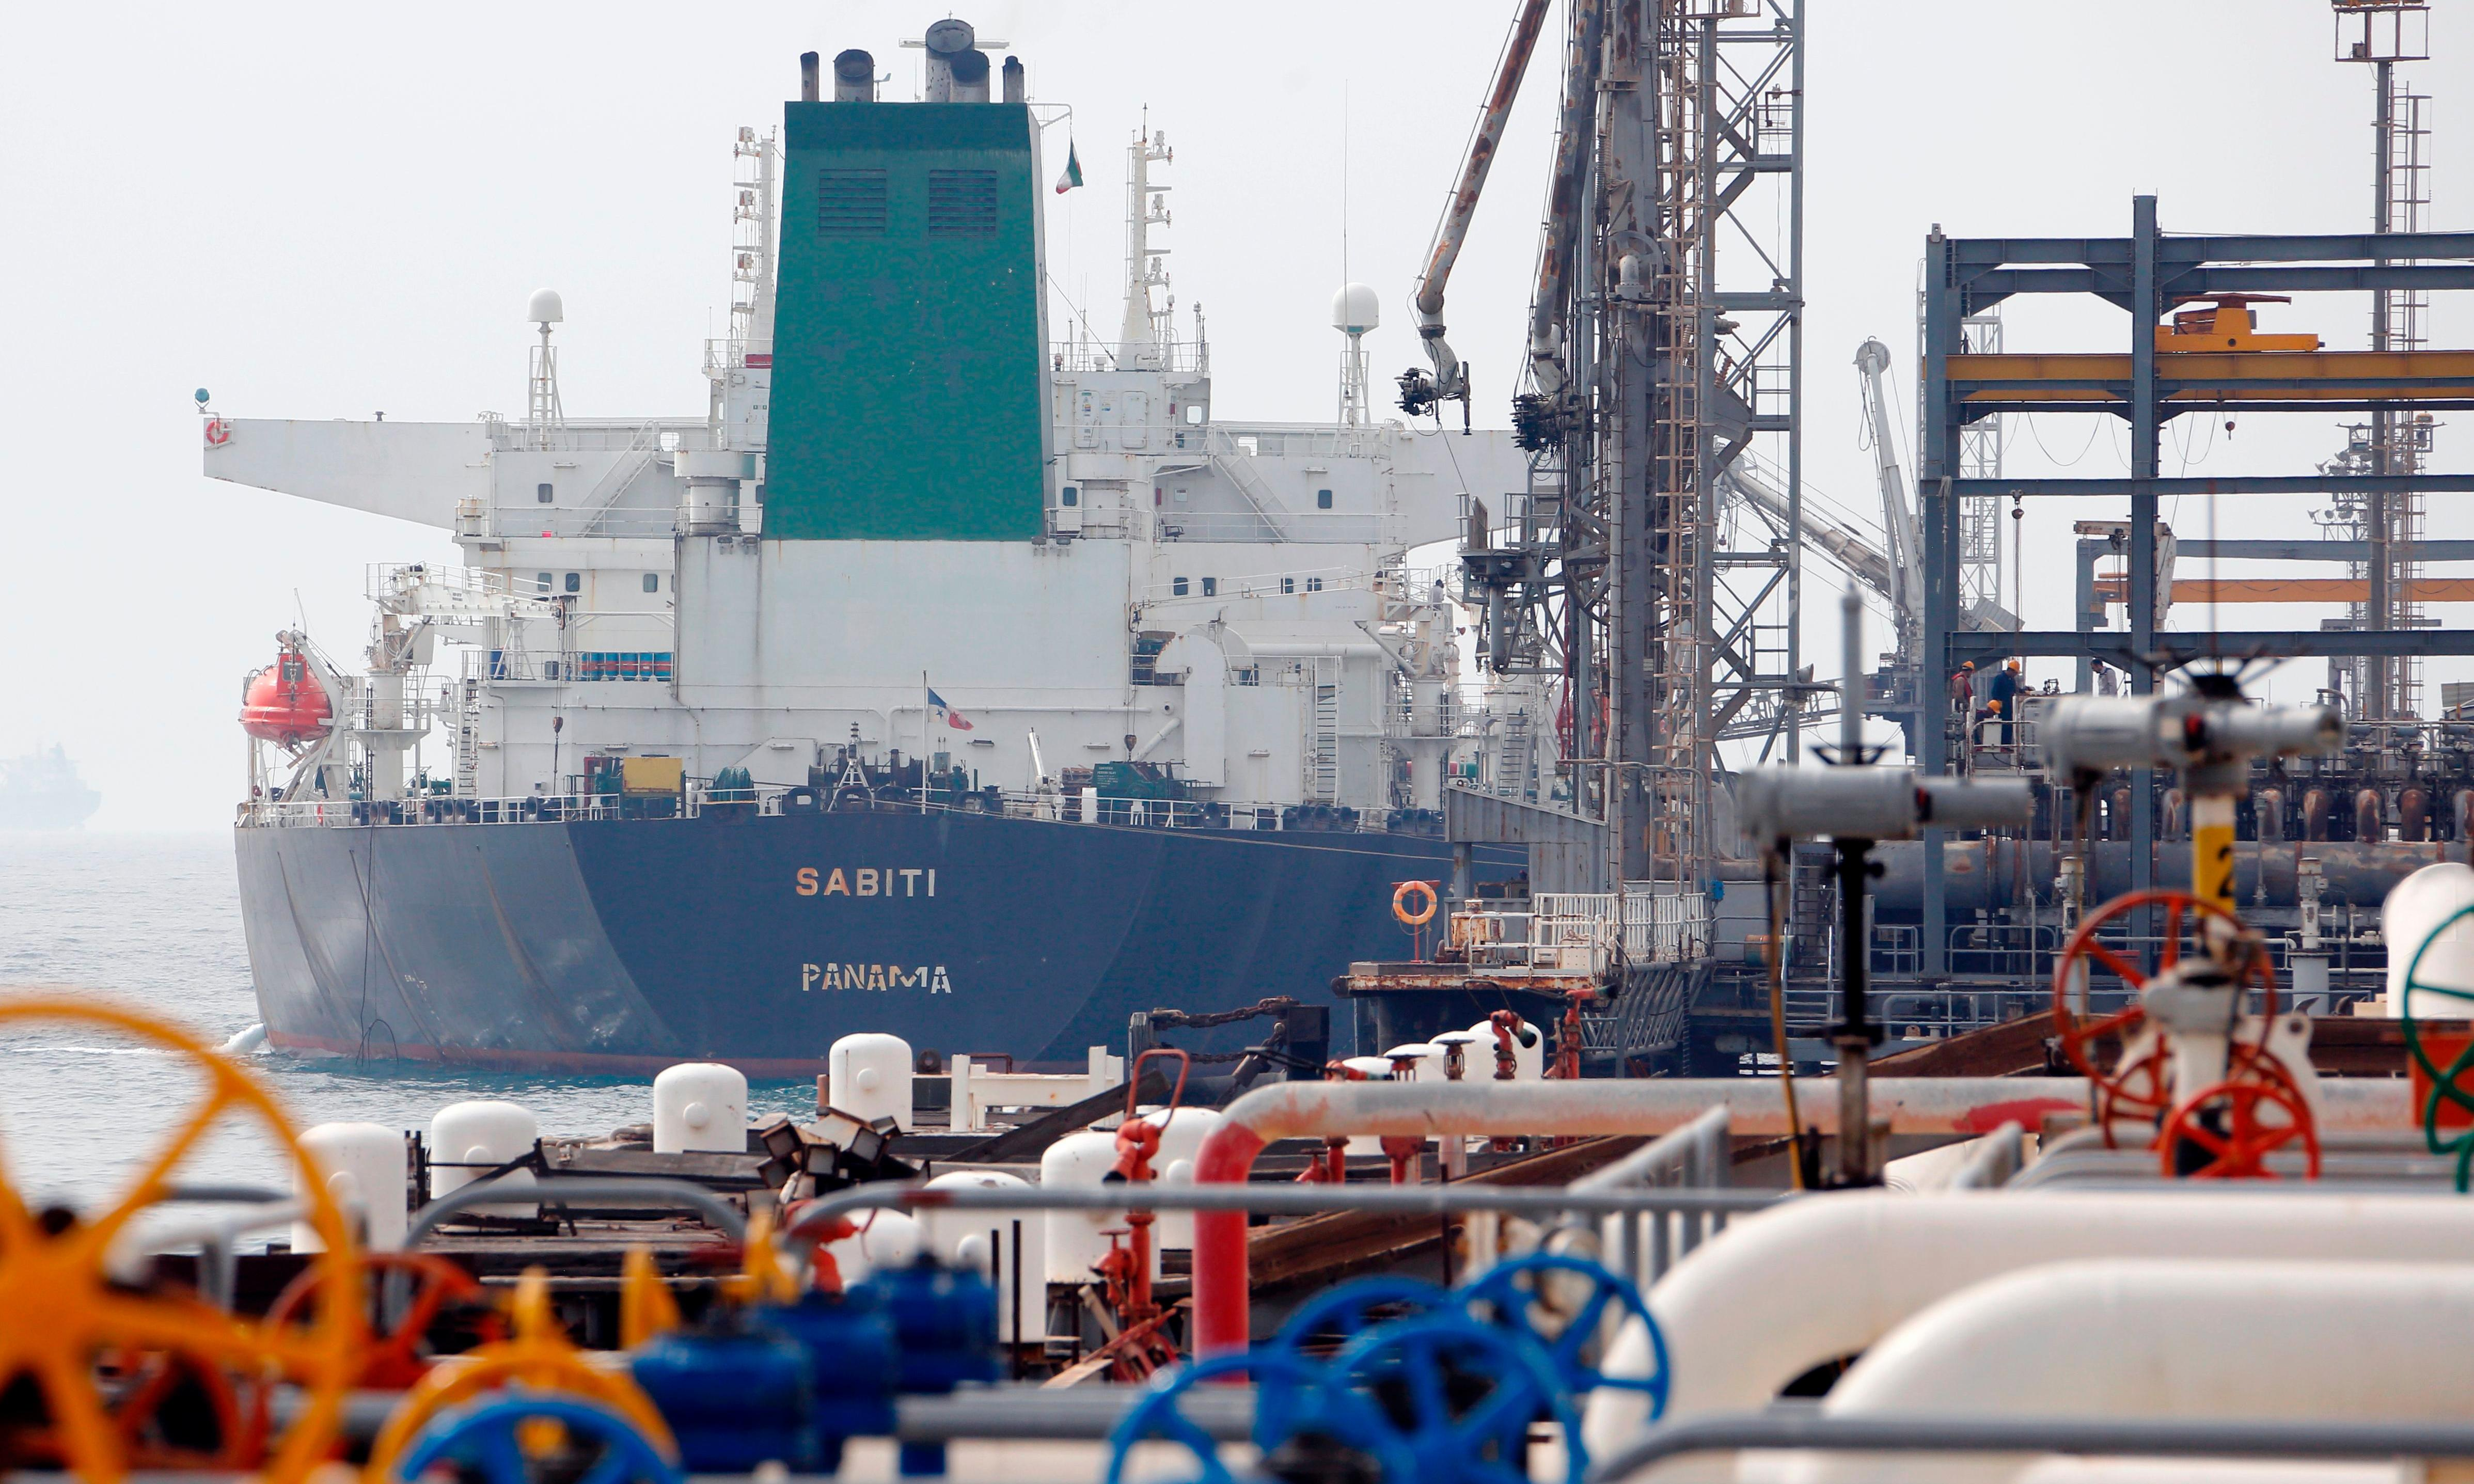 Iranian oil tanker damaged by explosions near Saudi port city